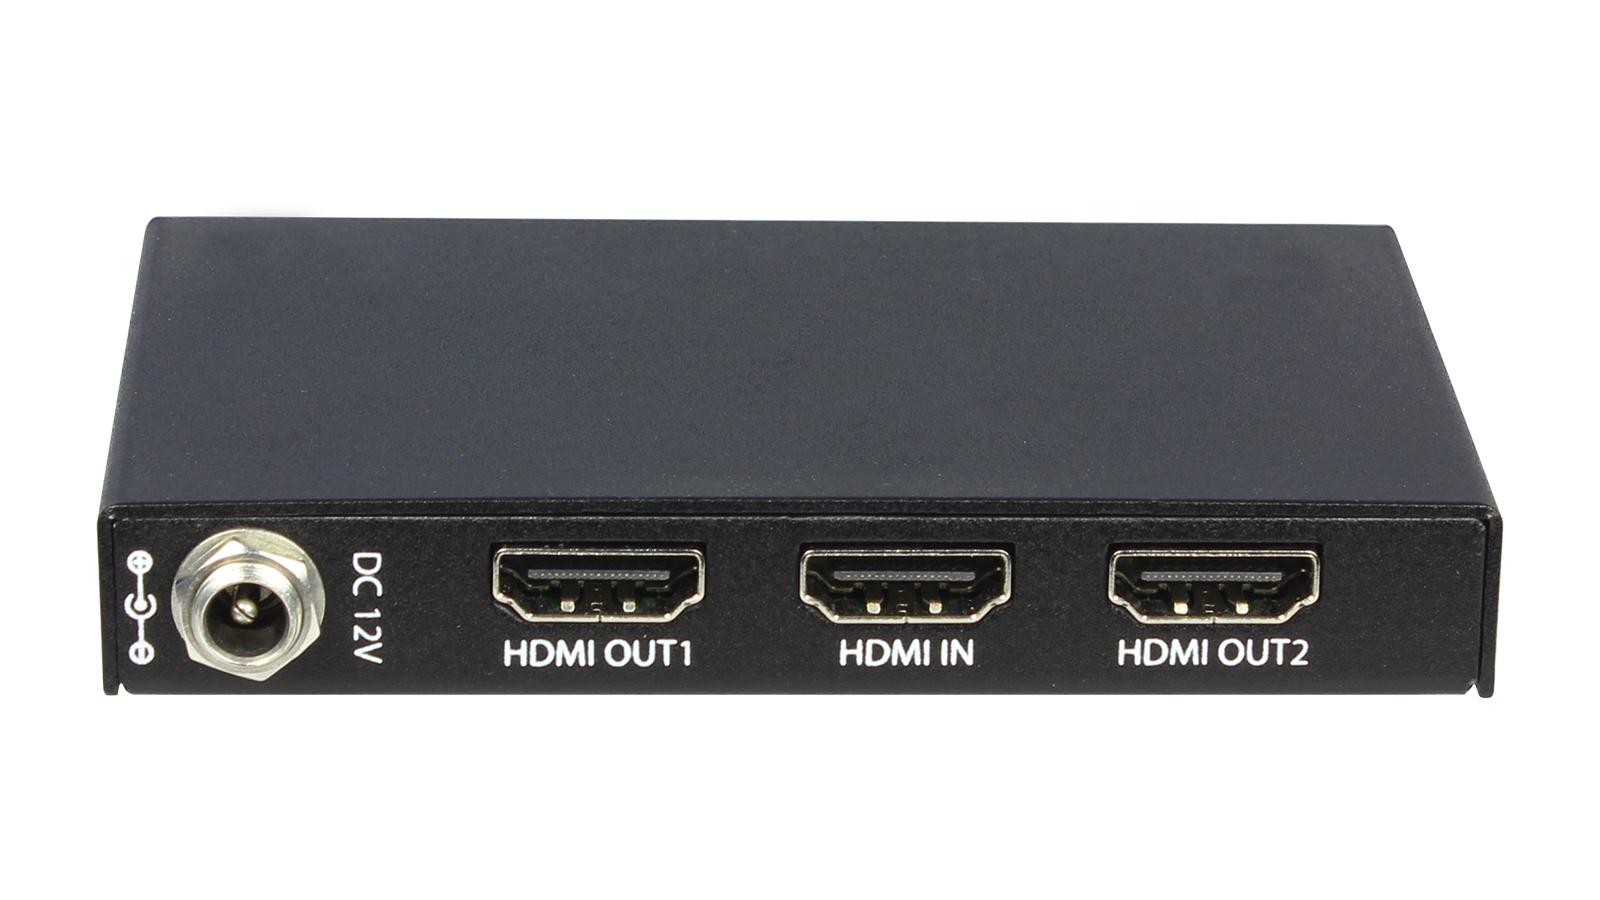 1x2 Slim HDMI Distribution Amplifier